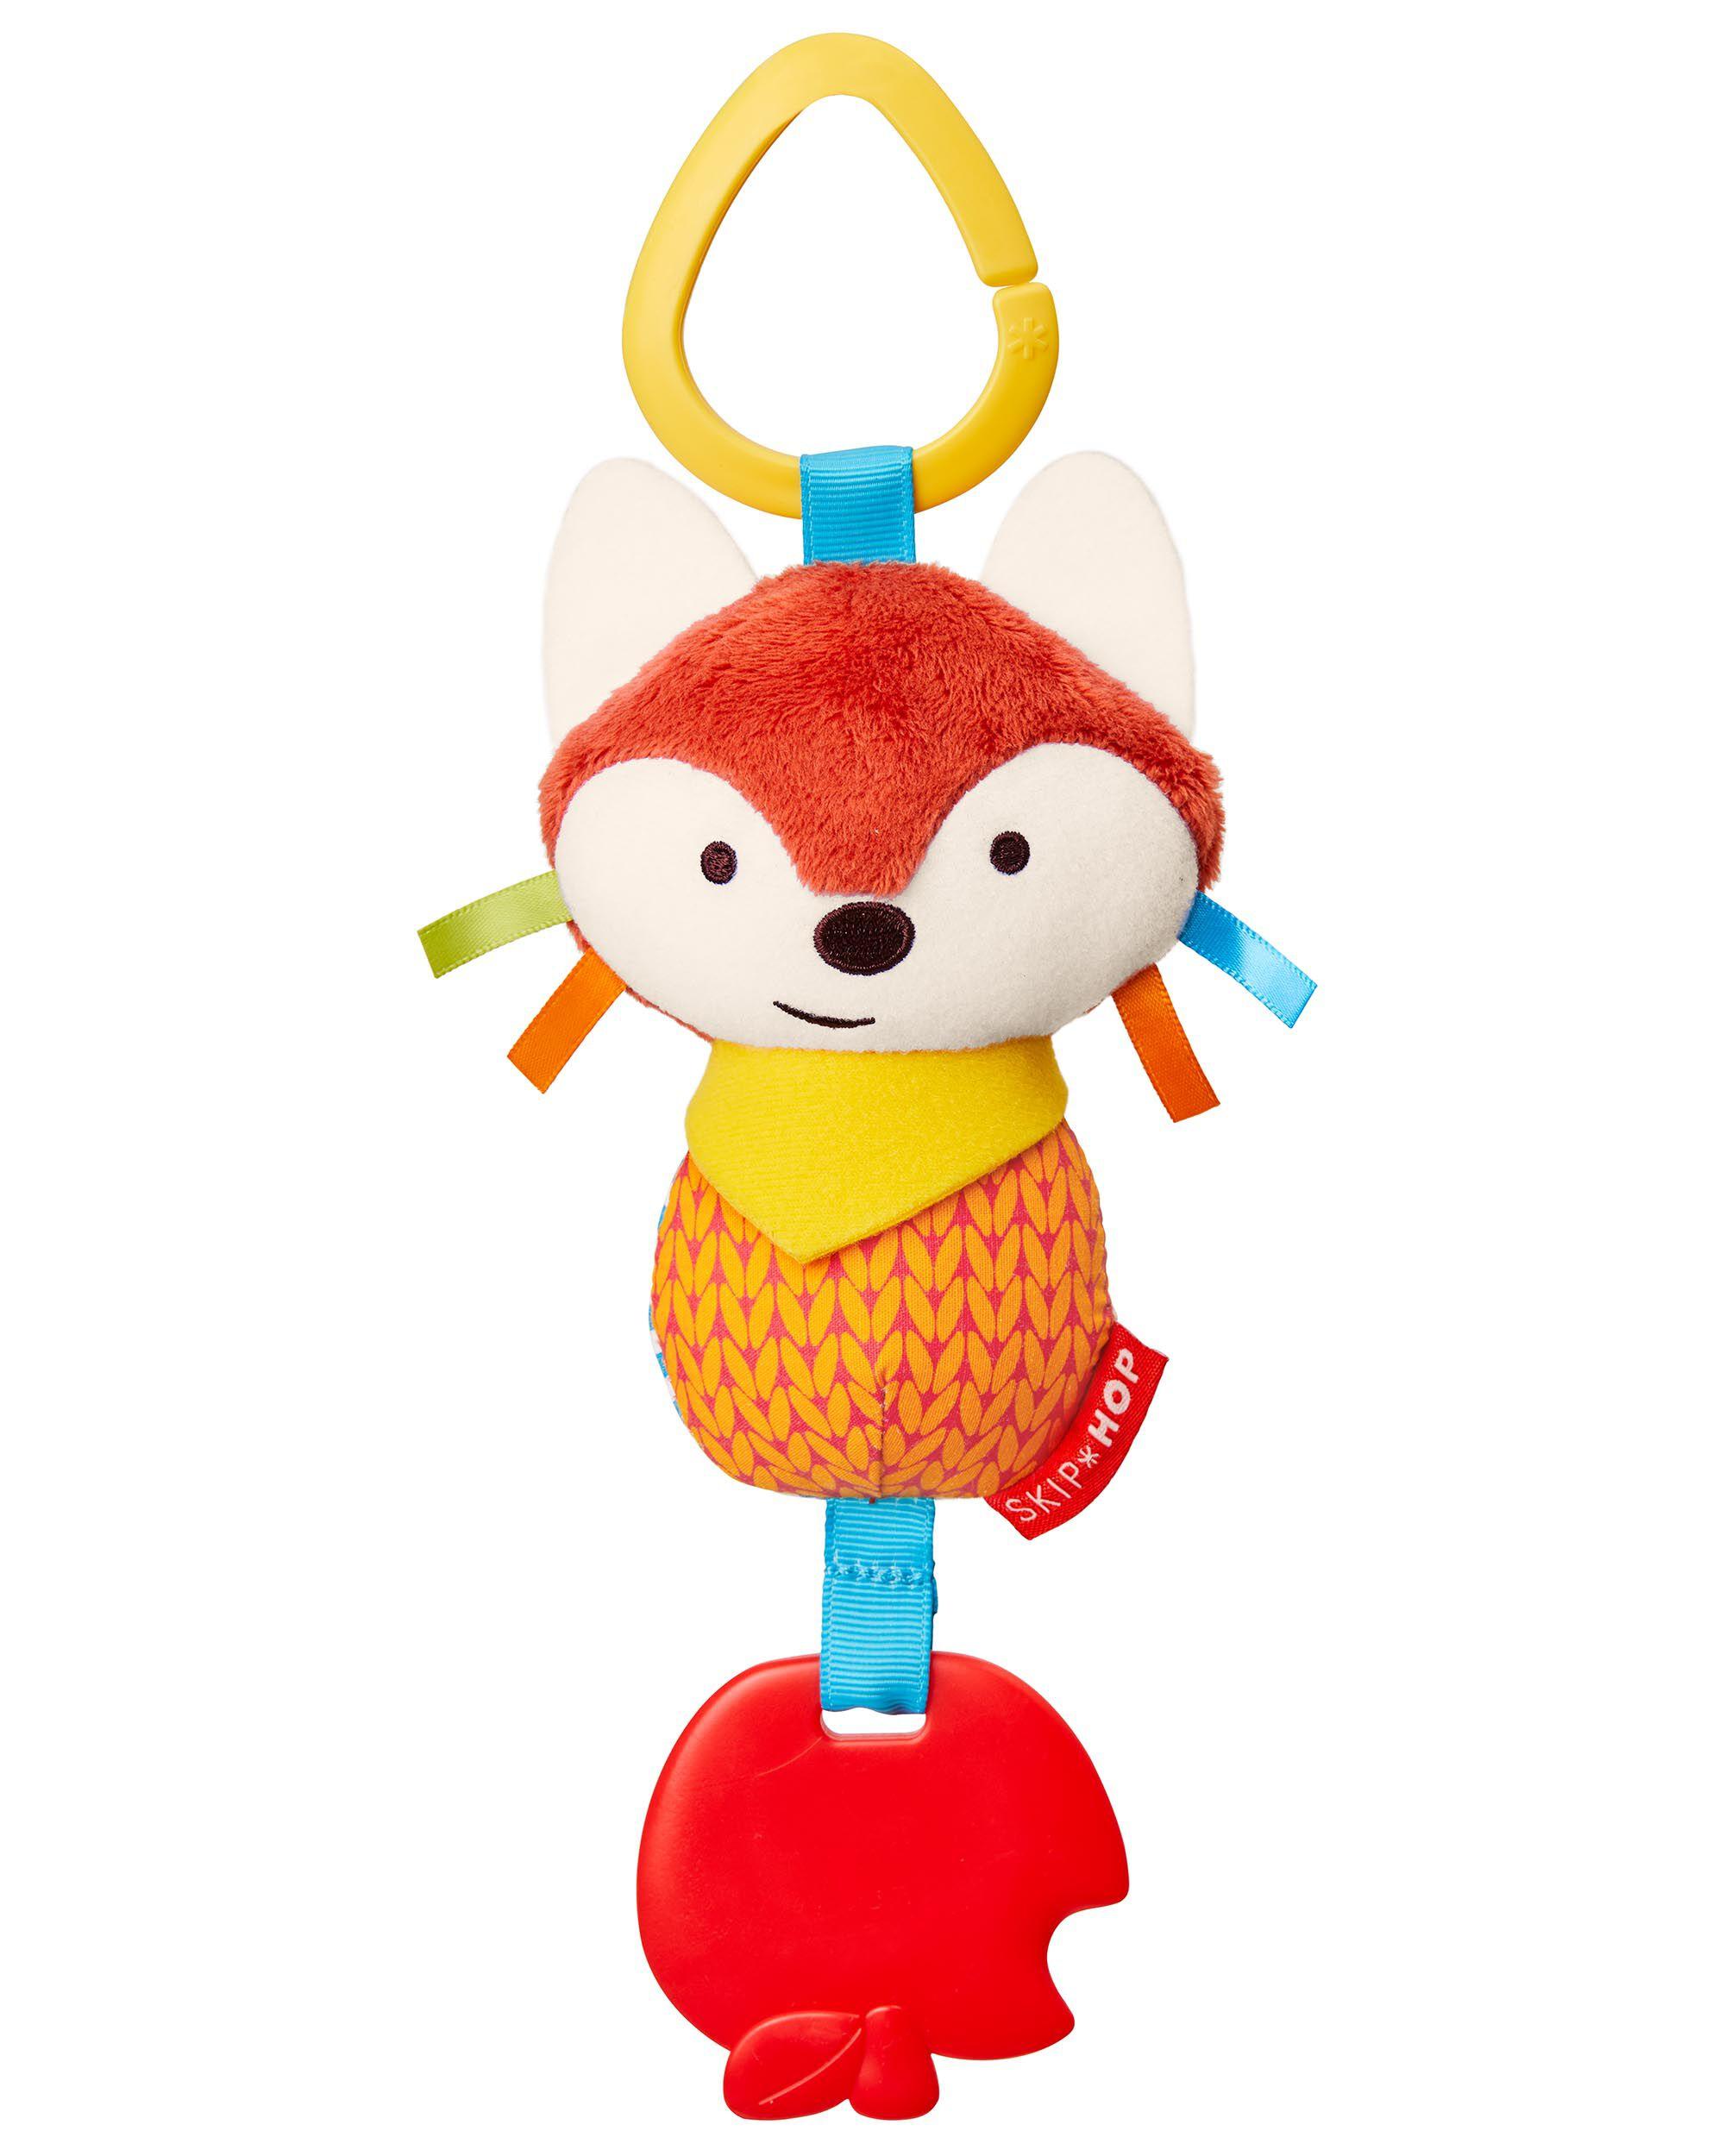 Bandana Buddies Chime & Teethe Toy